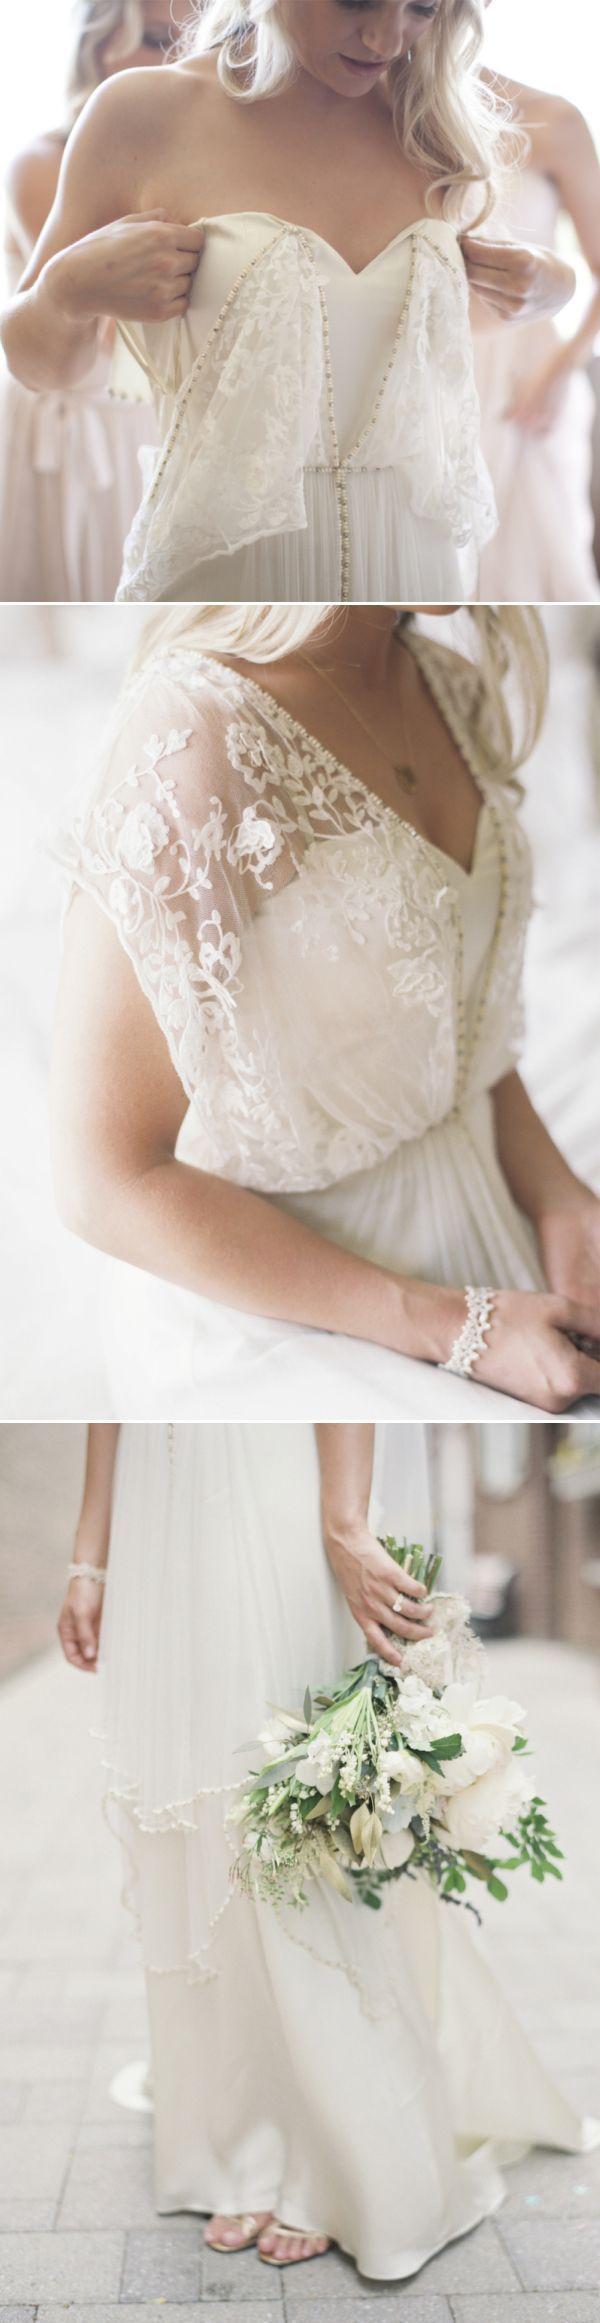 best wedding images on pinterest wedding dressses groom